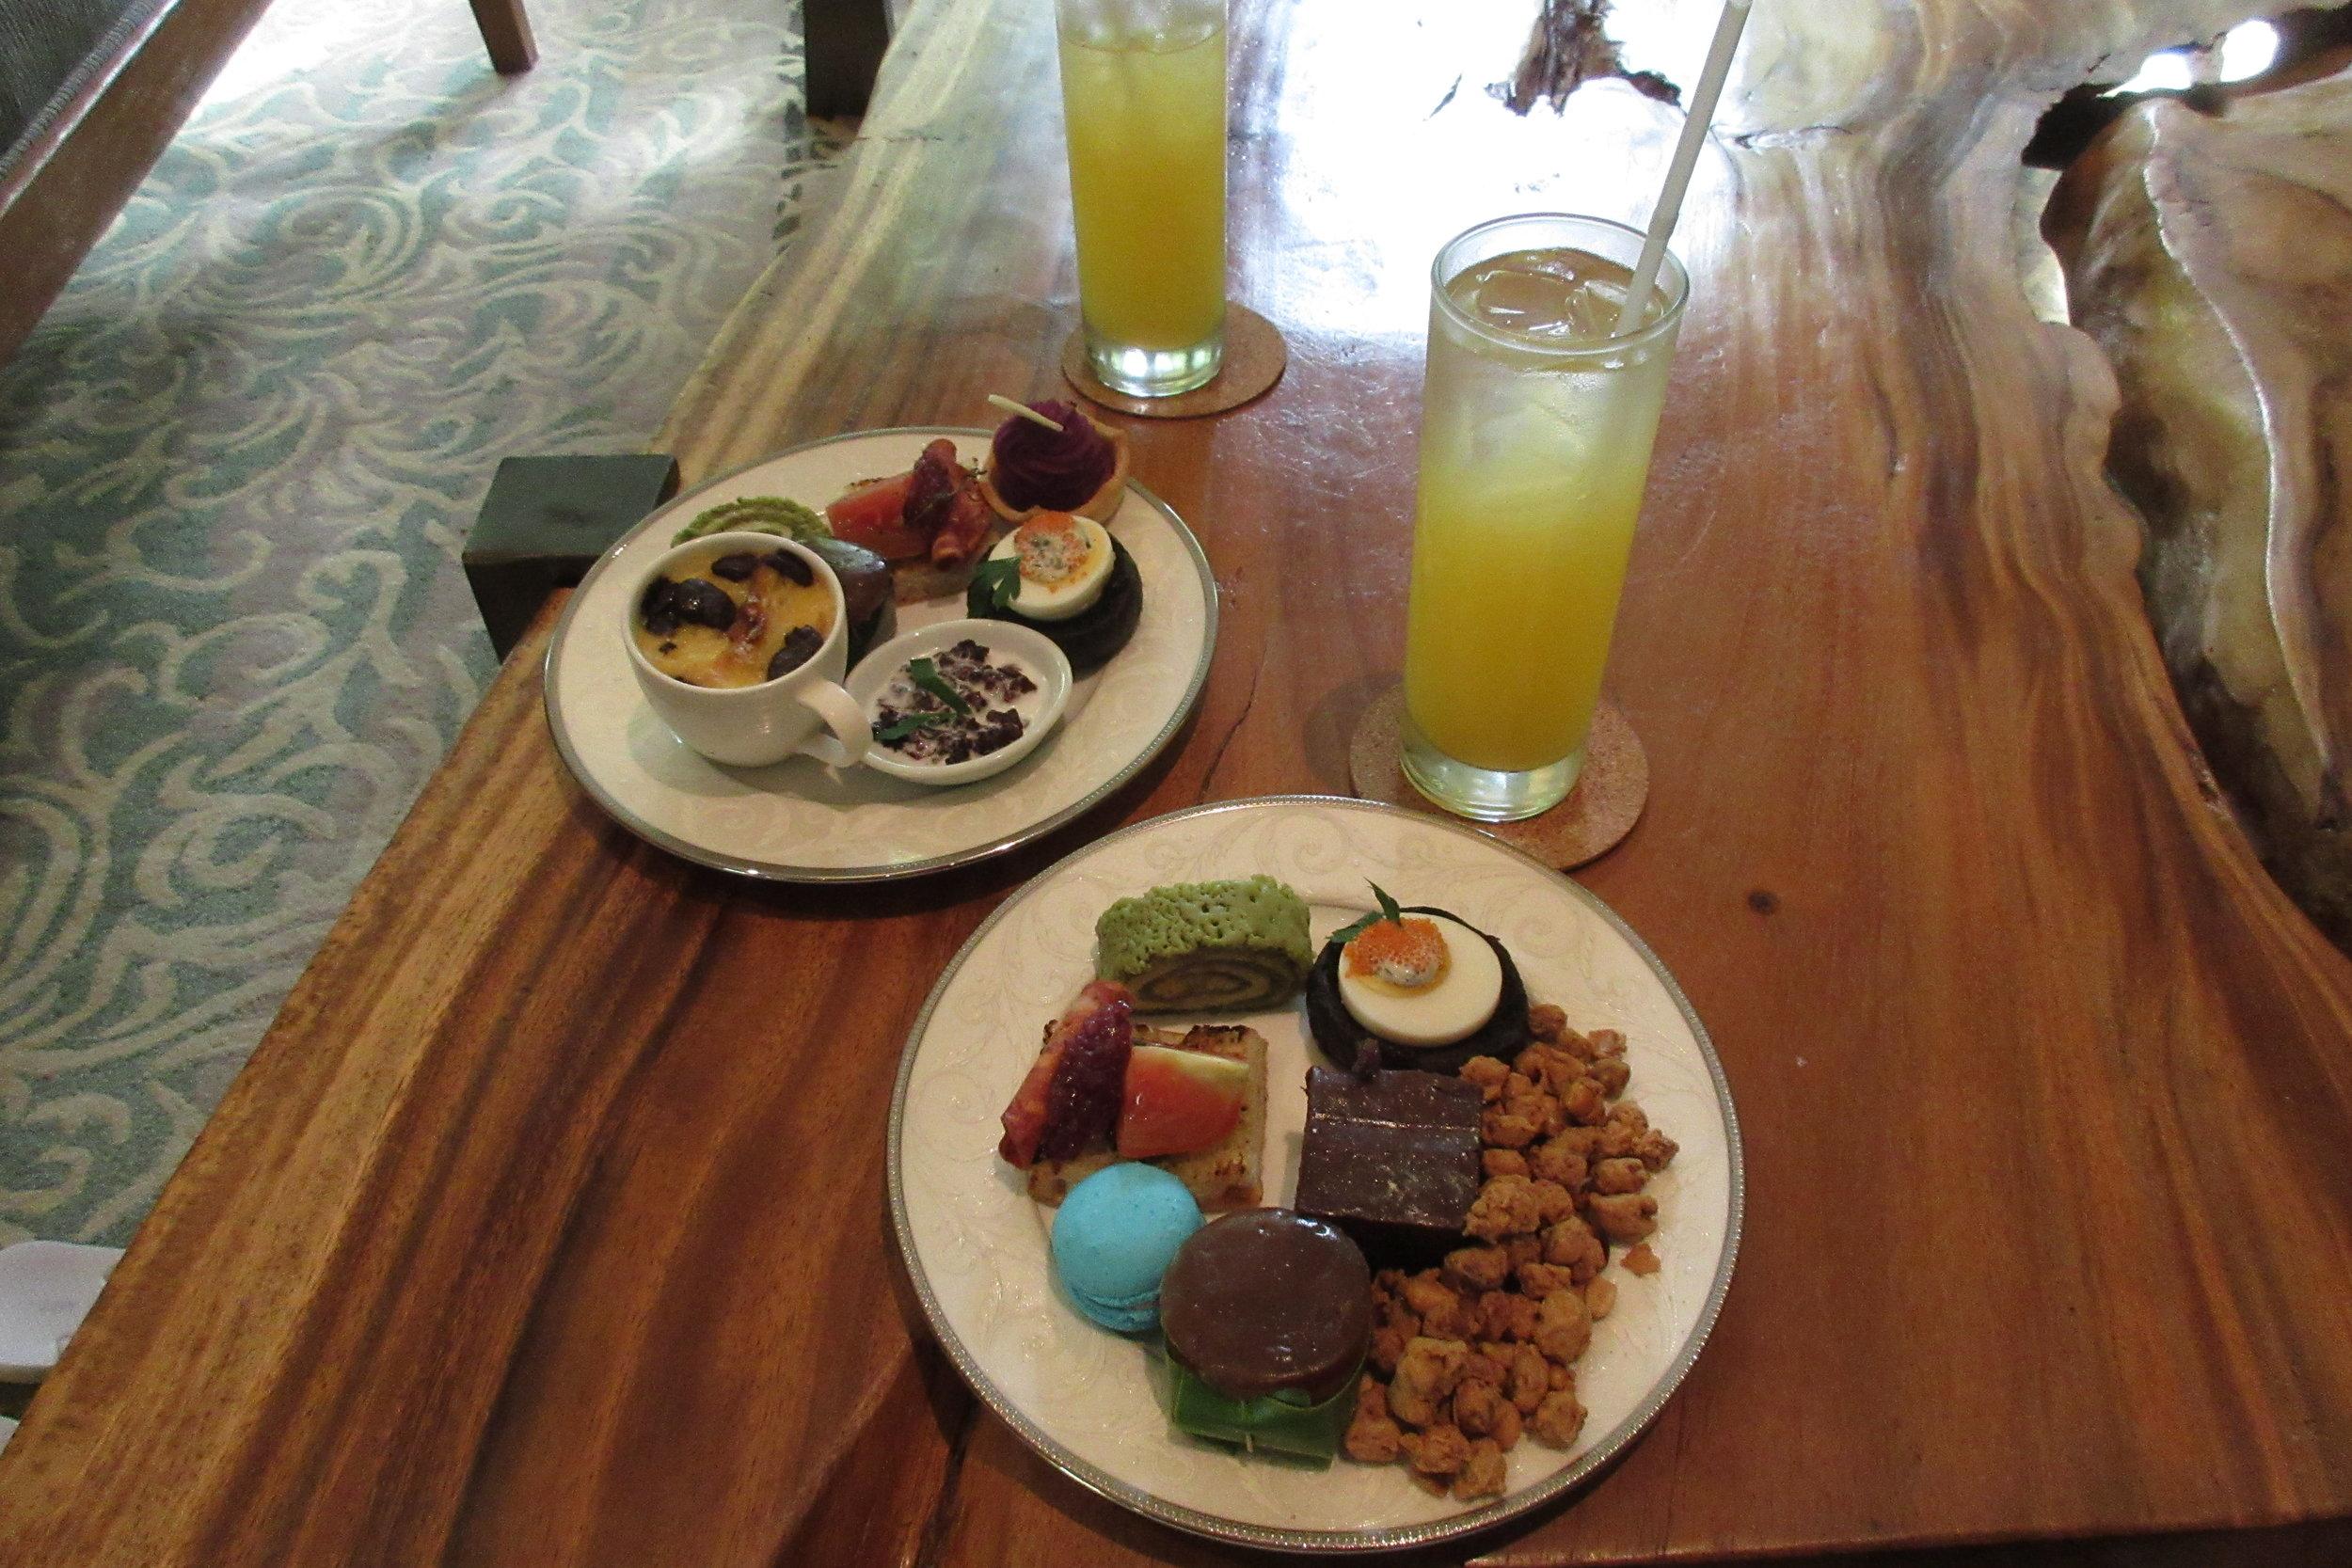 The Ritz-Carlton, Bali – Afternoon tea